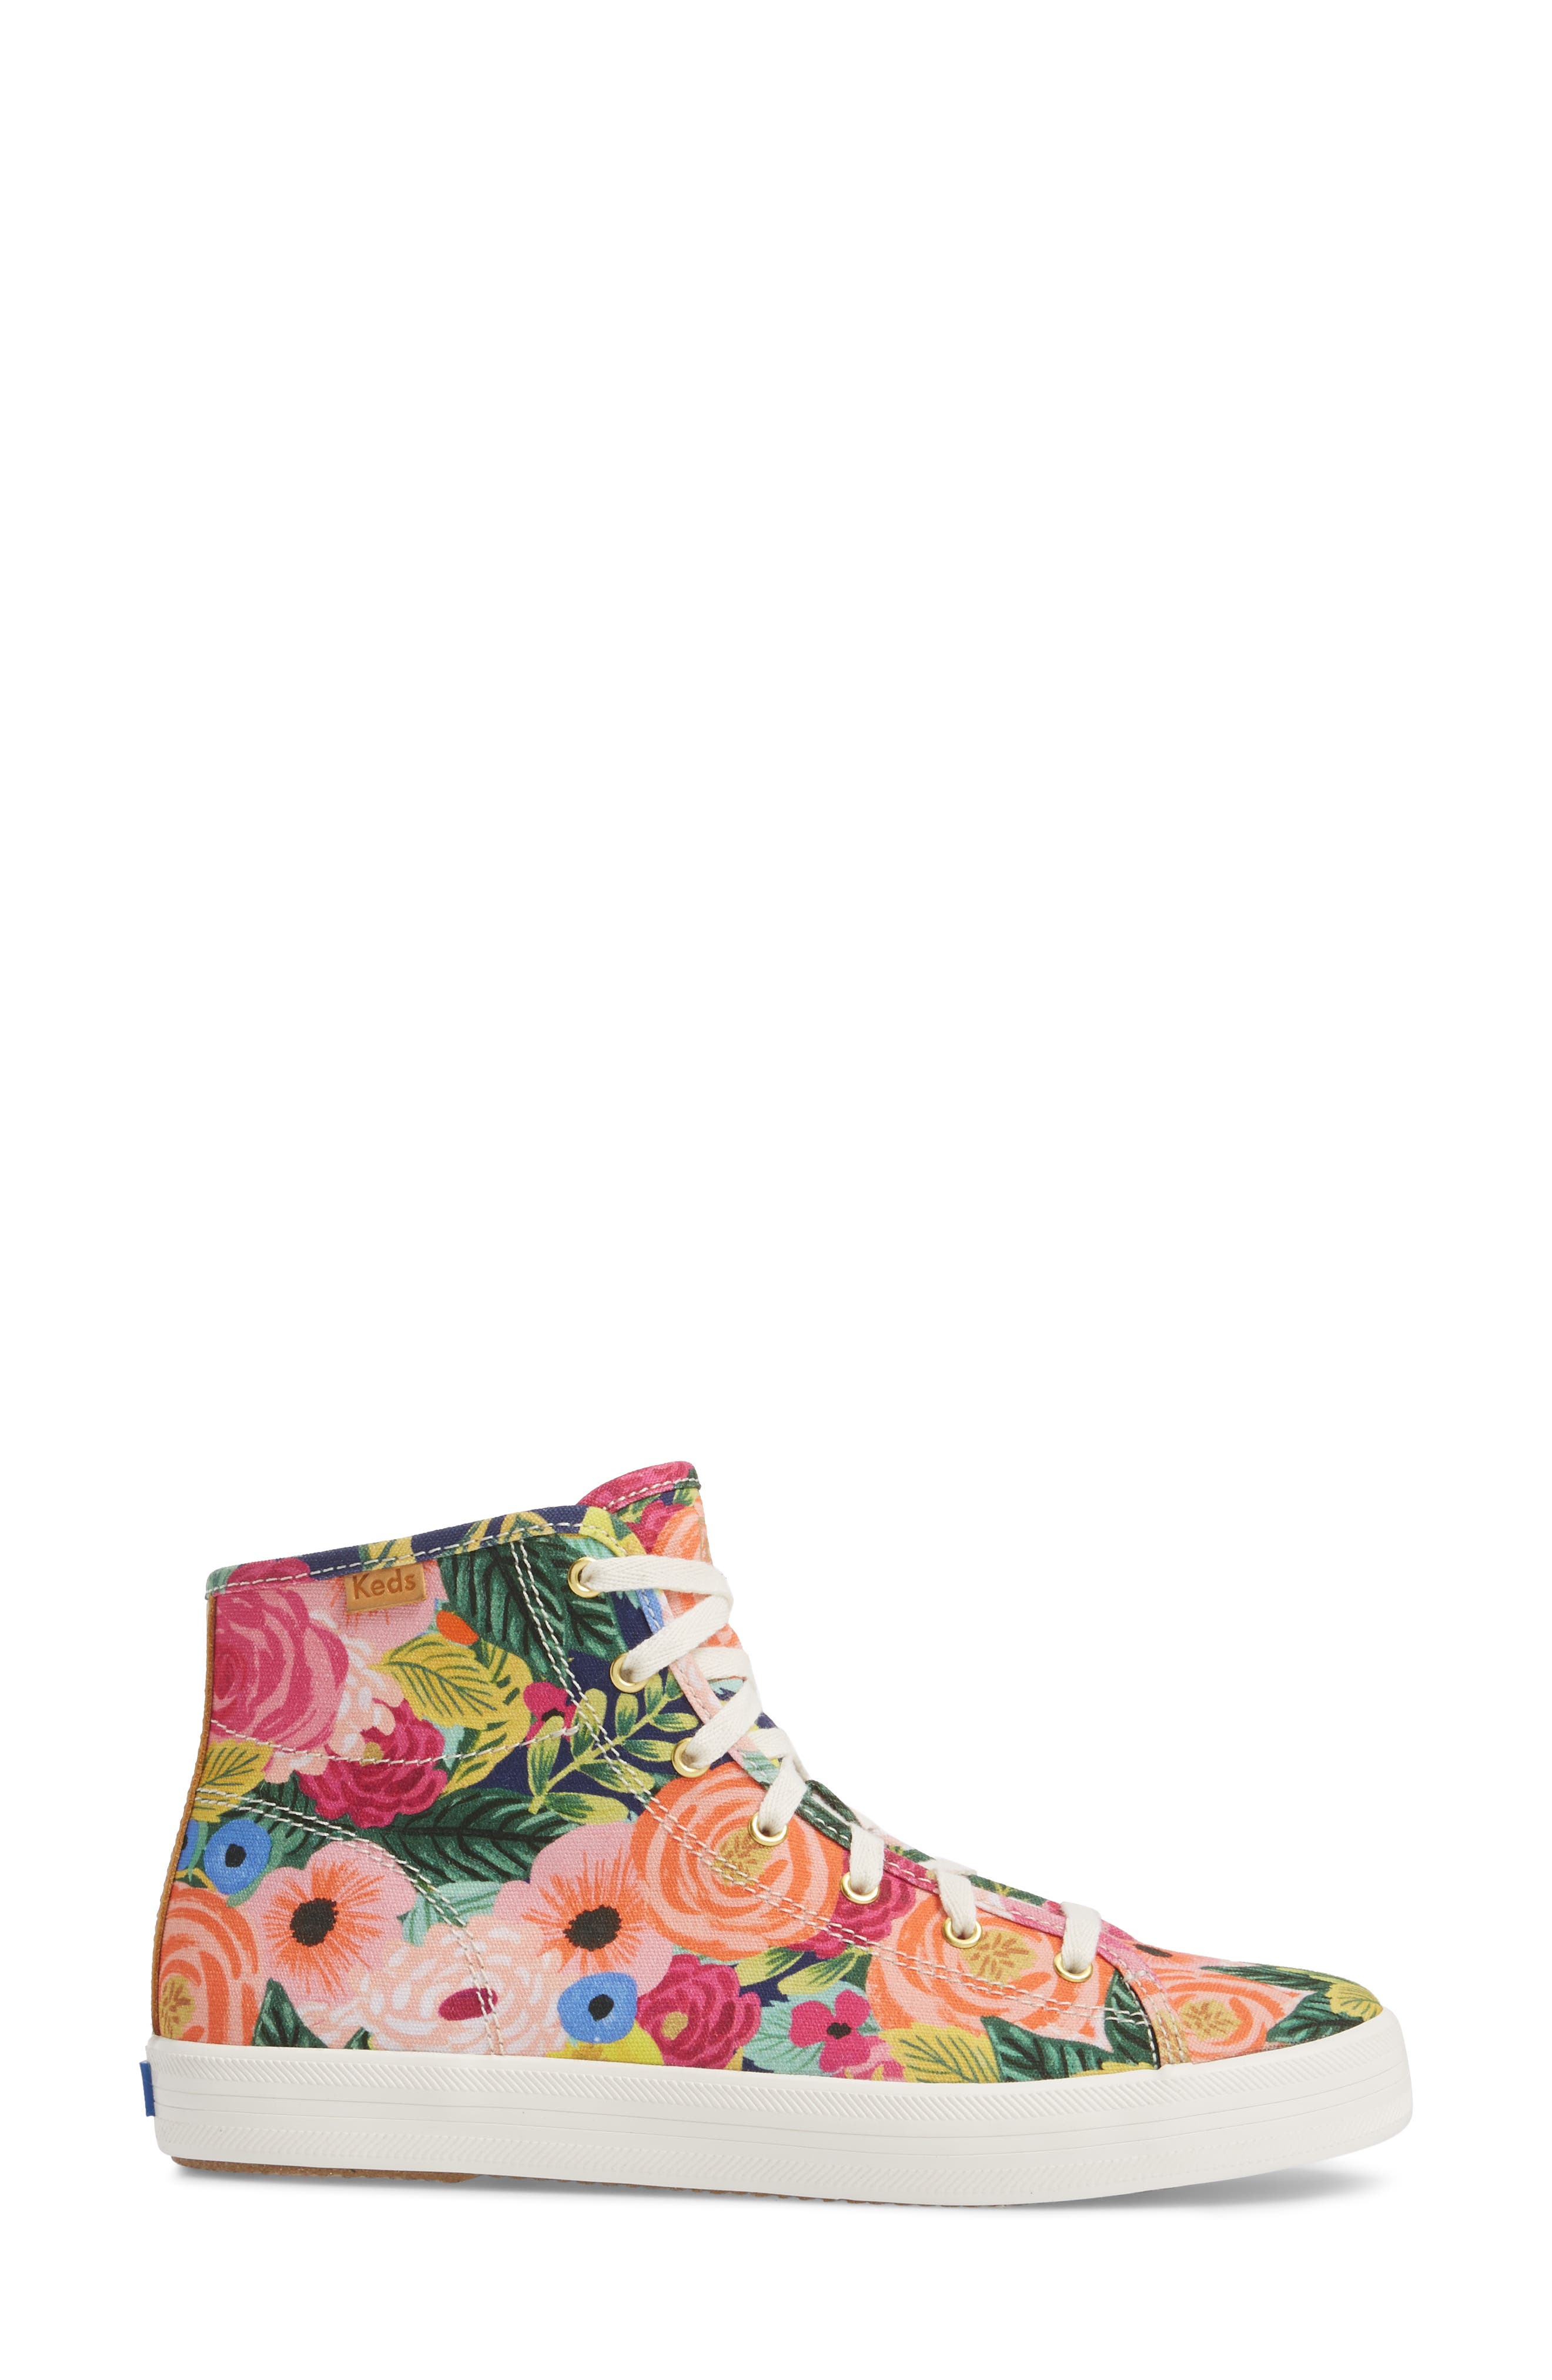 x Rifle Paper Co. Kickstart Julie High Top Sneaker,                             Alternate thumbnail 3, color,                             PINK MULTI